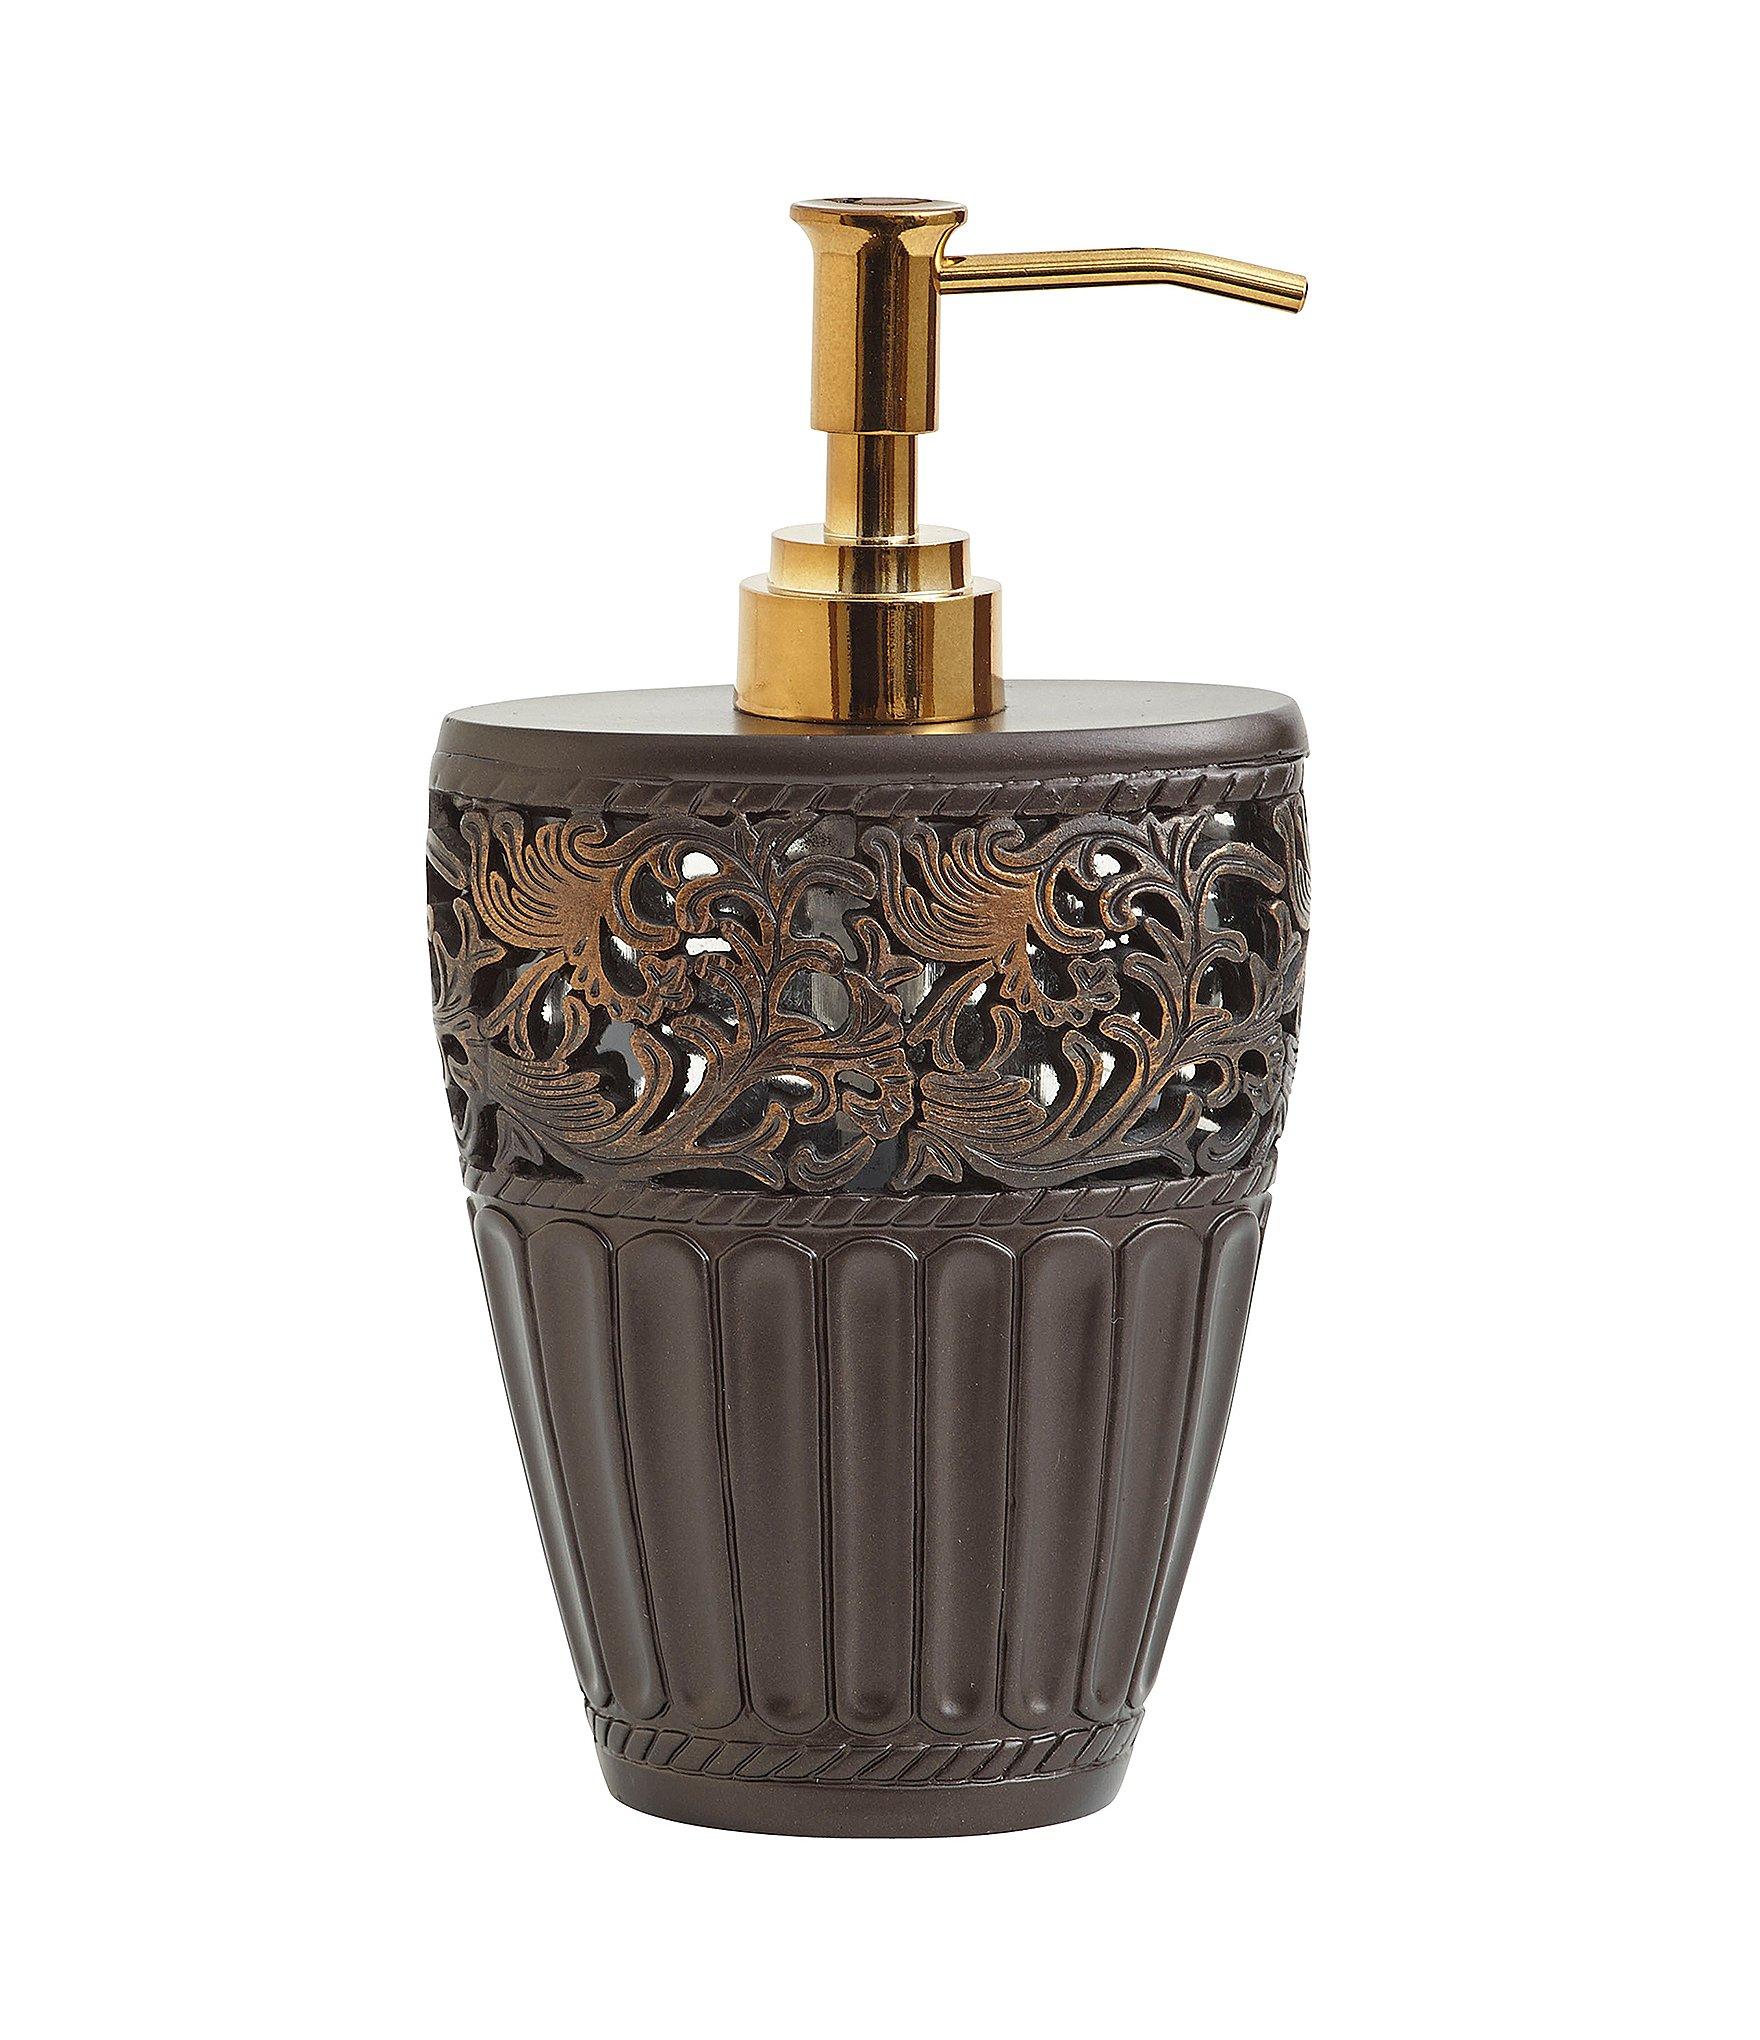 Croscill marrakesh lotion dispenser dillards for Dillards bathroom accessories